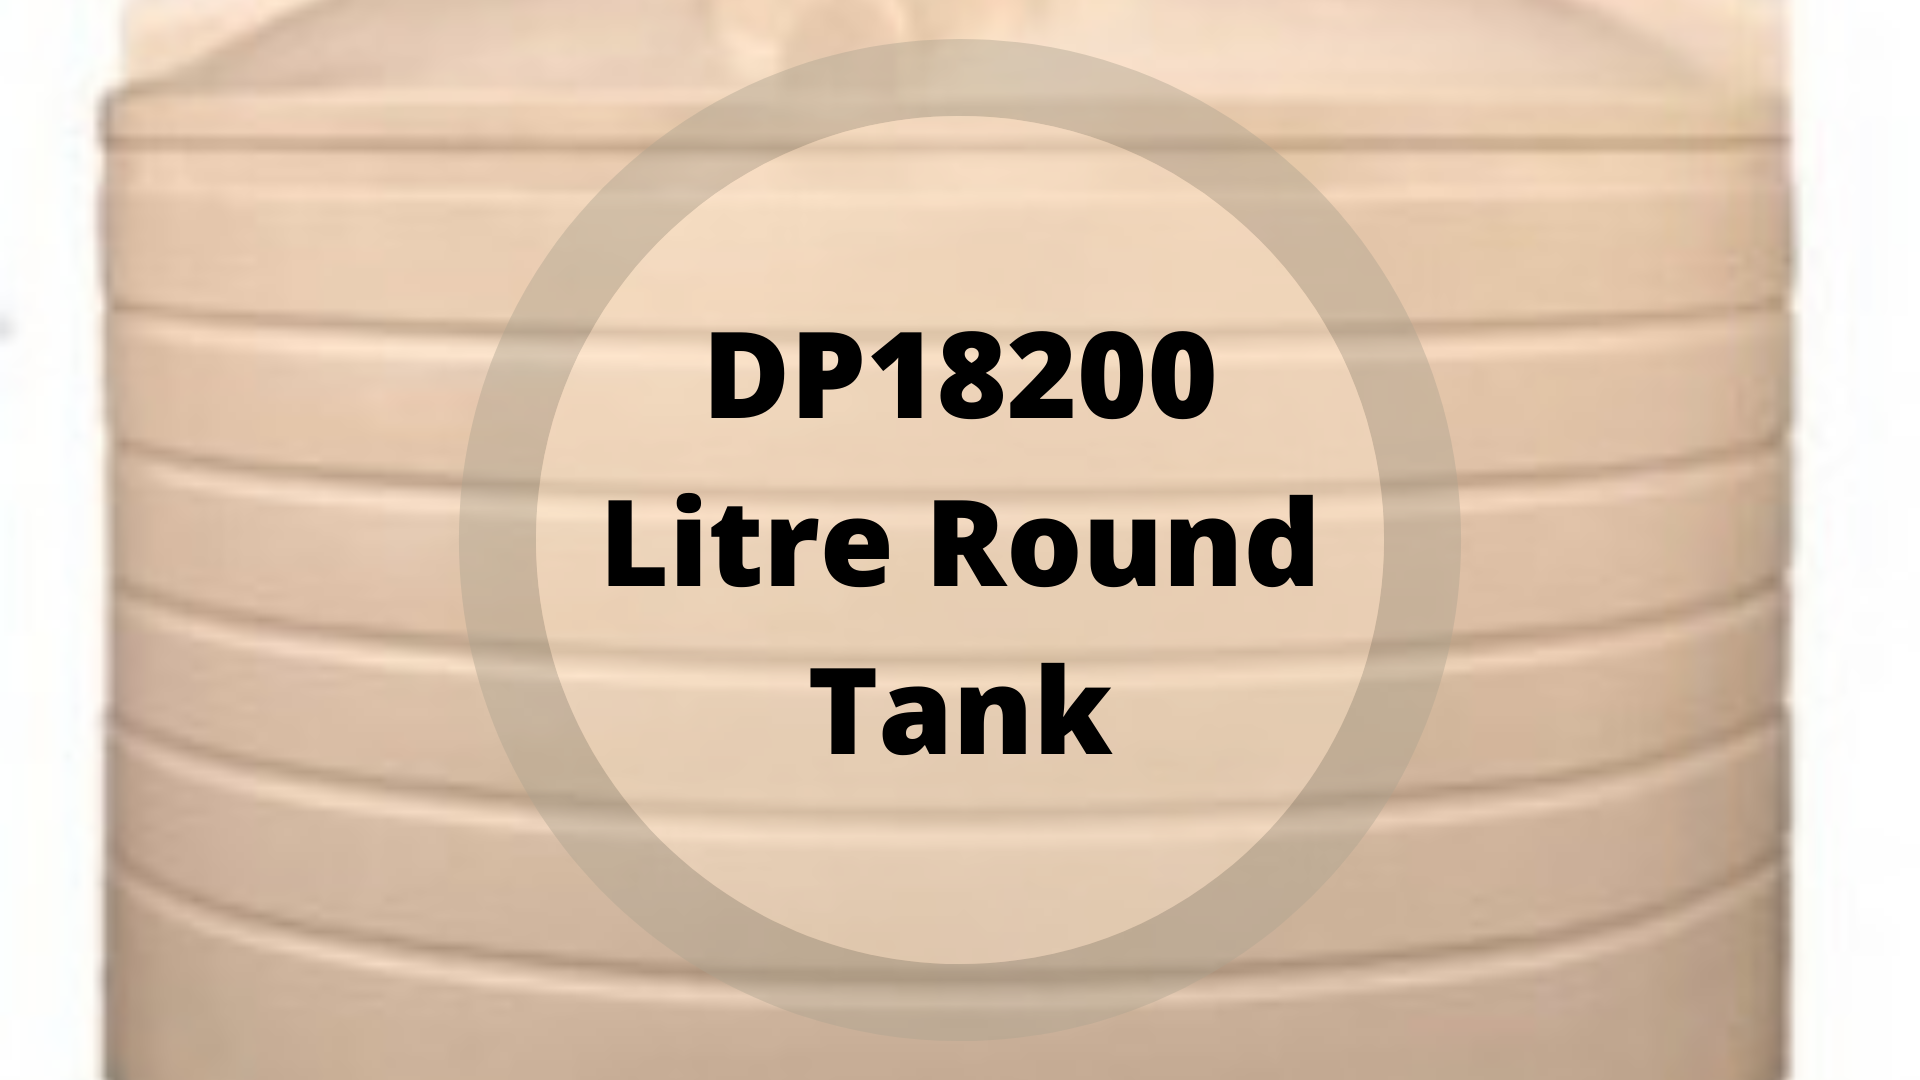 Dp18200 Litre Round Tank In 2020 Water Tank Water Storage Tank